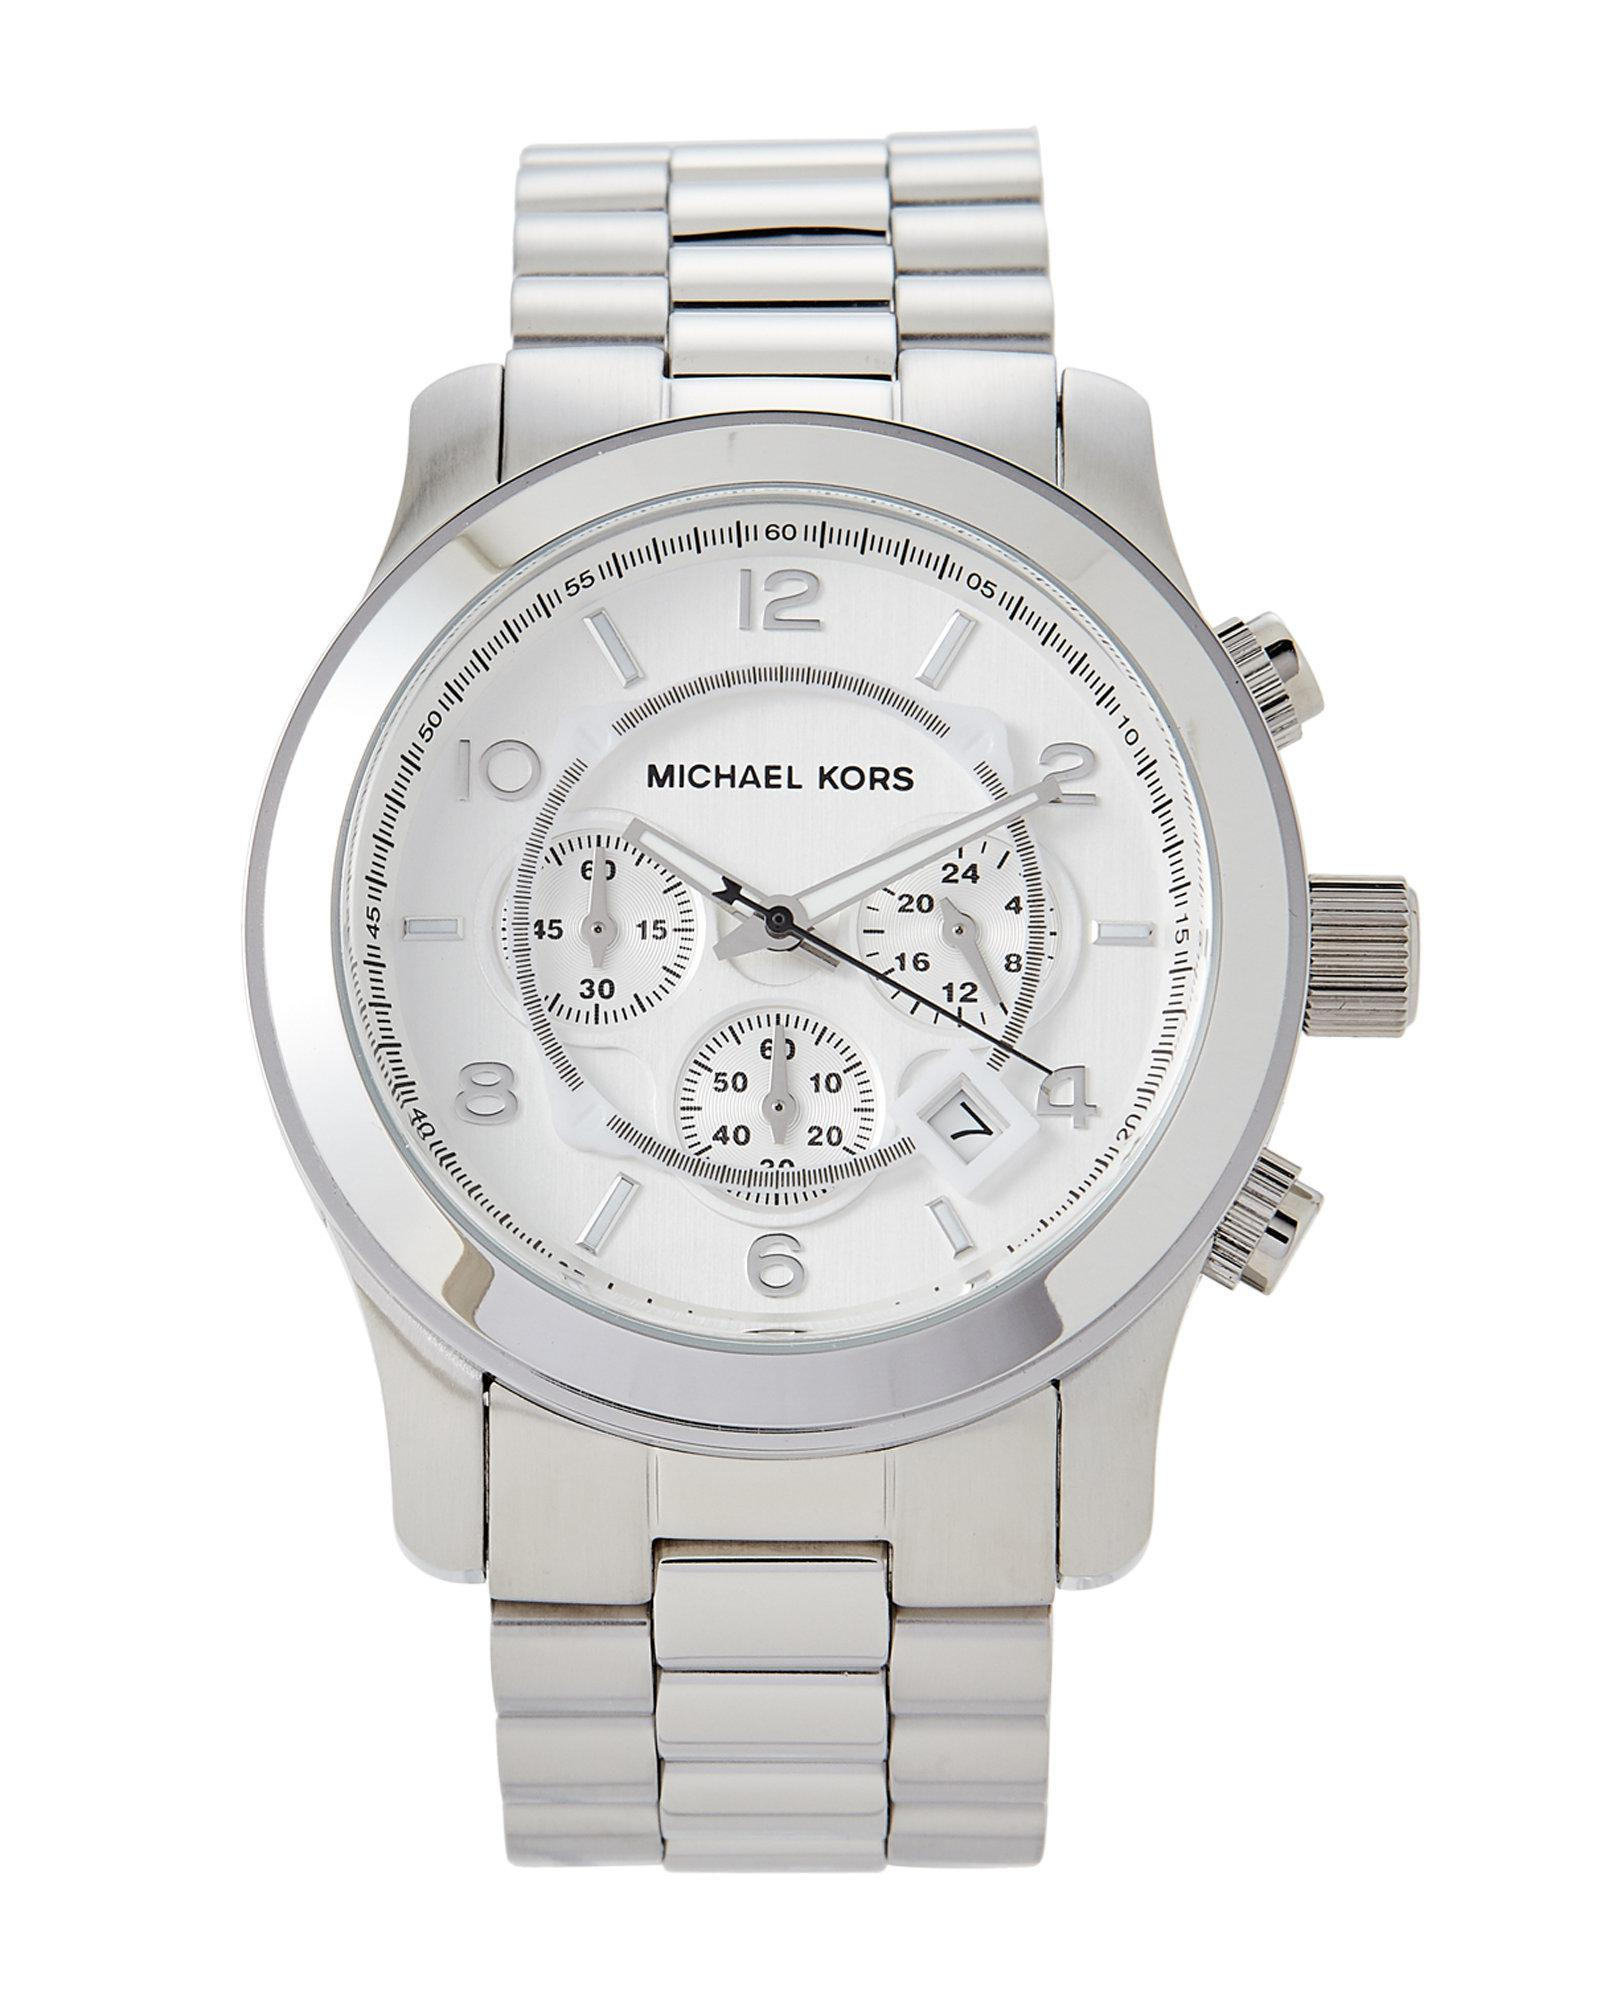 Lyst - Michael Kors Mk8086 Silver-tone Runway Watch in Metallic for Men 1b33112ba2